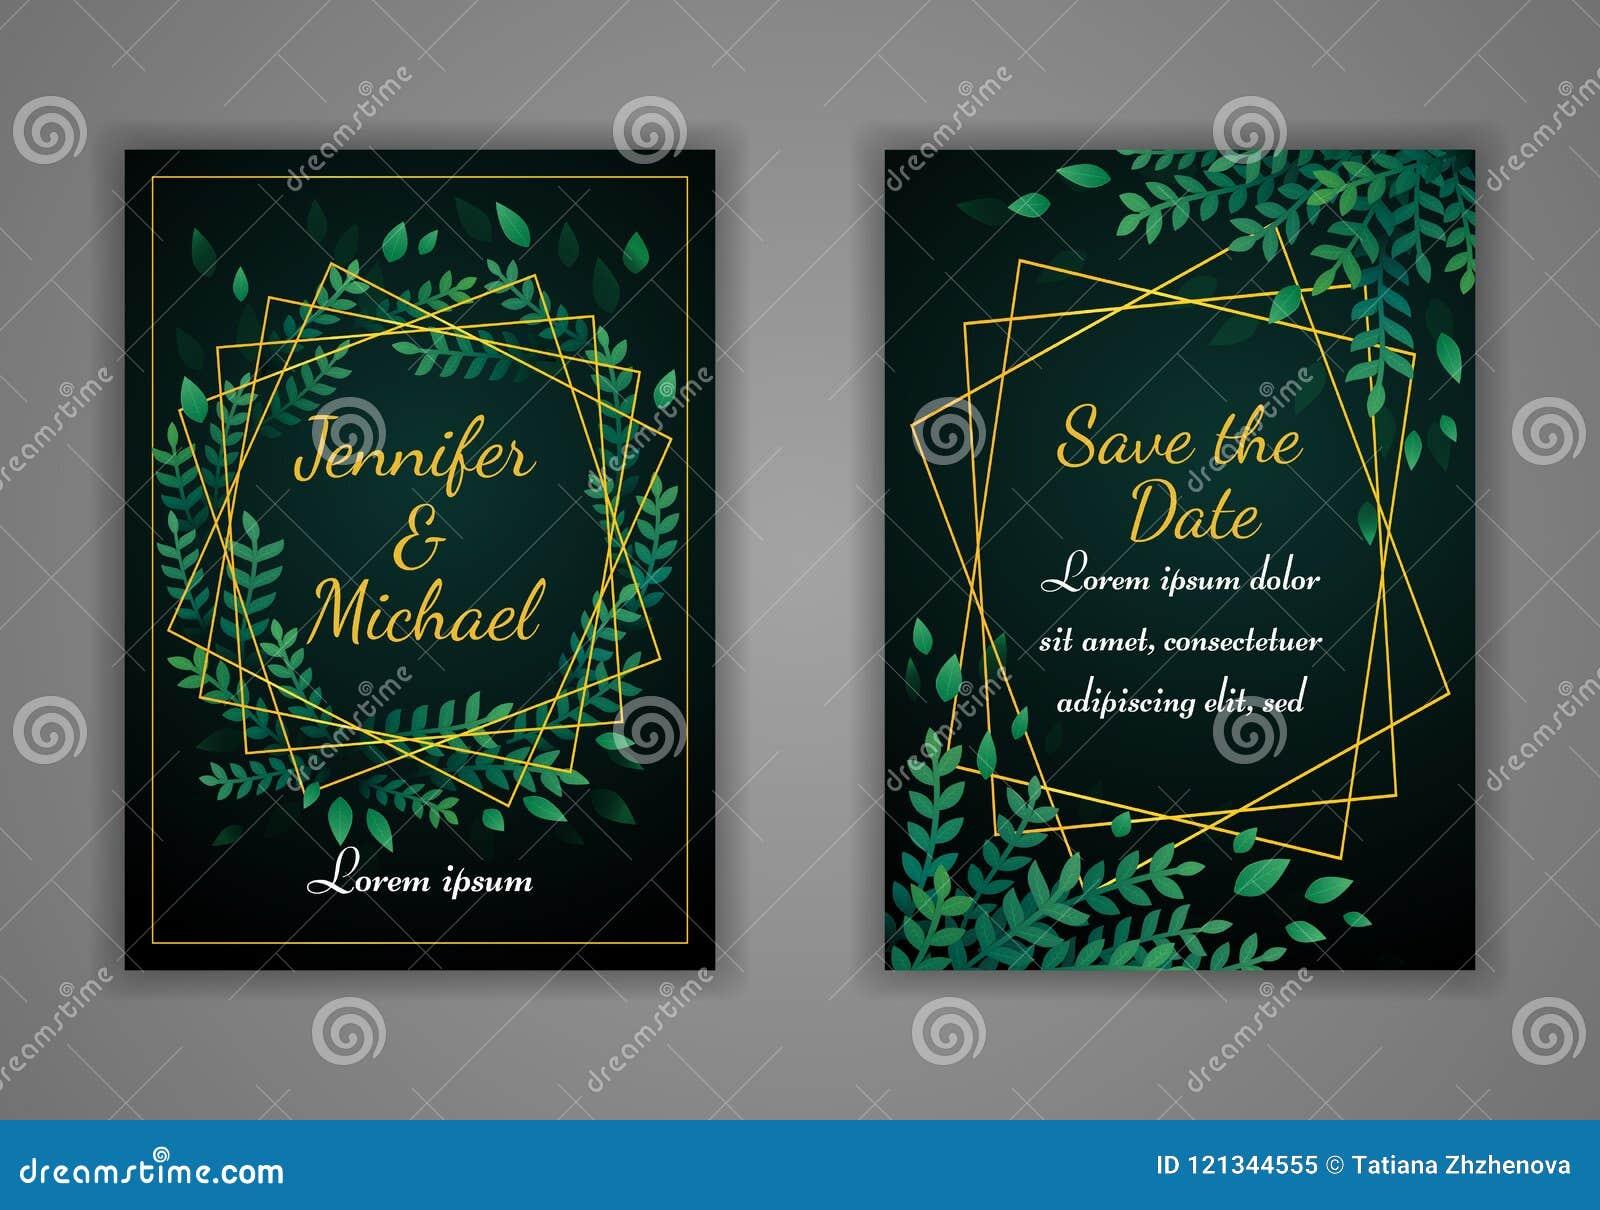 Set Of Rectangular Wedding Invitation Cards Green Leaves And Golden